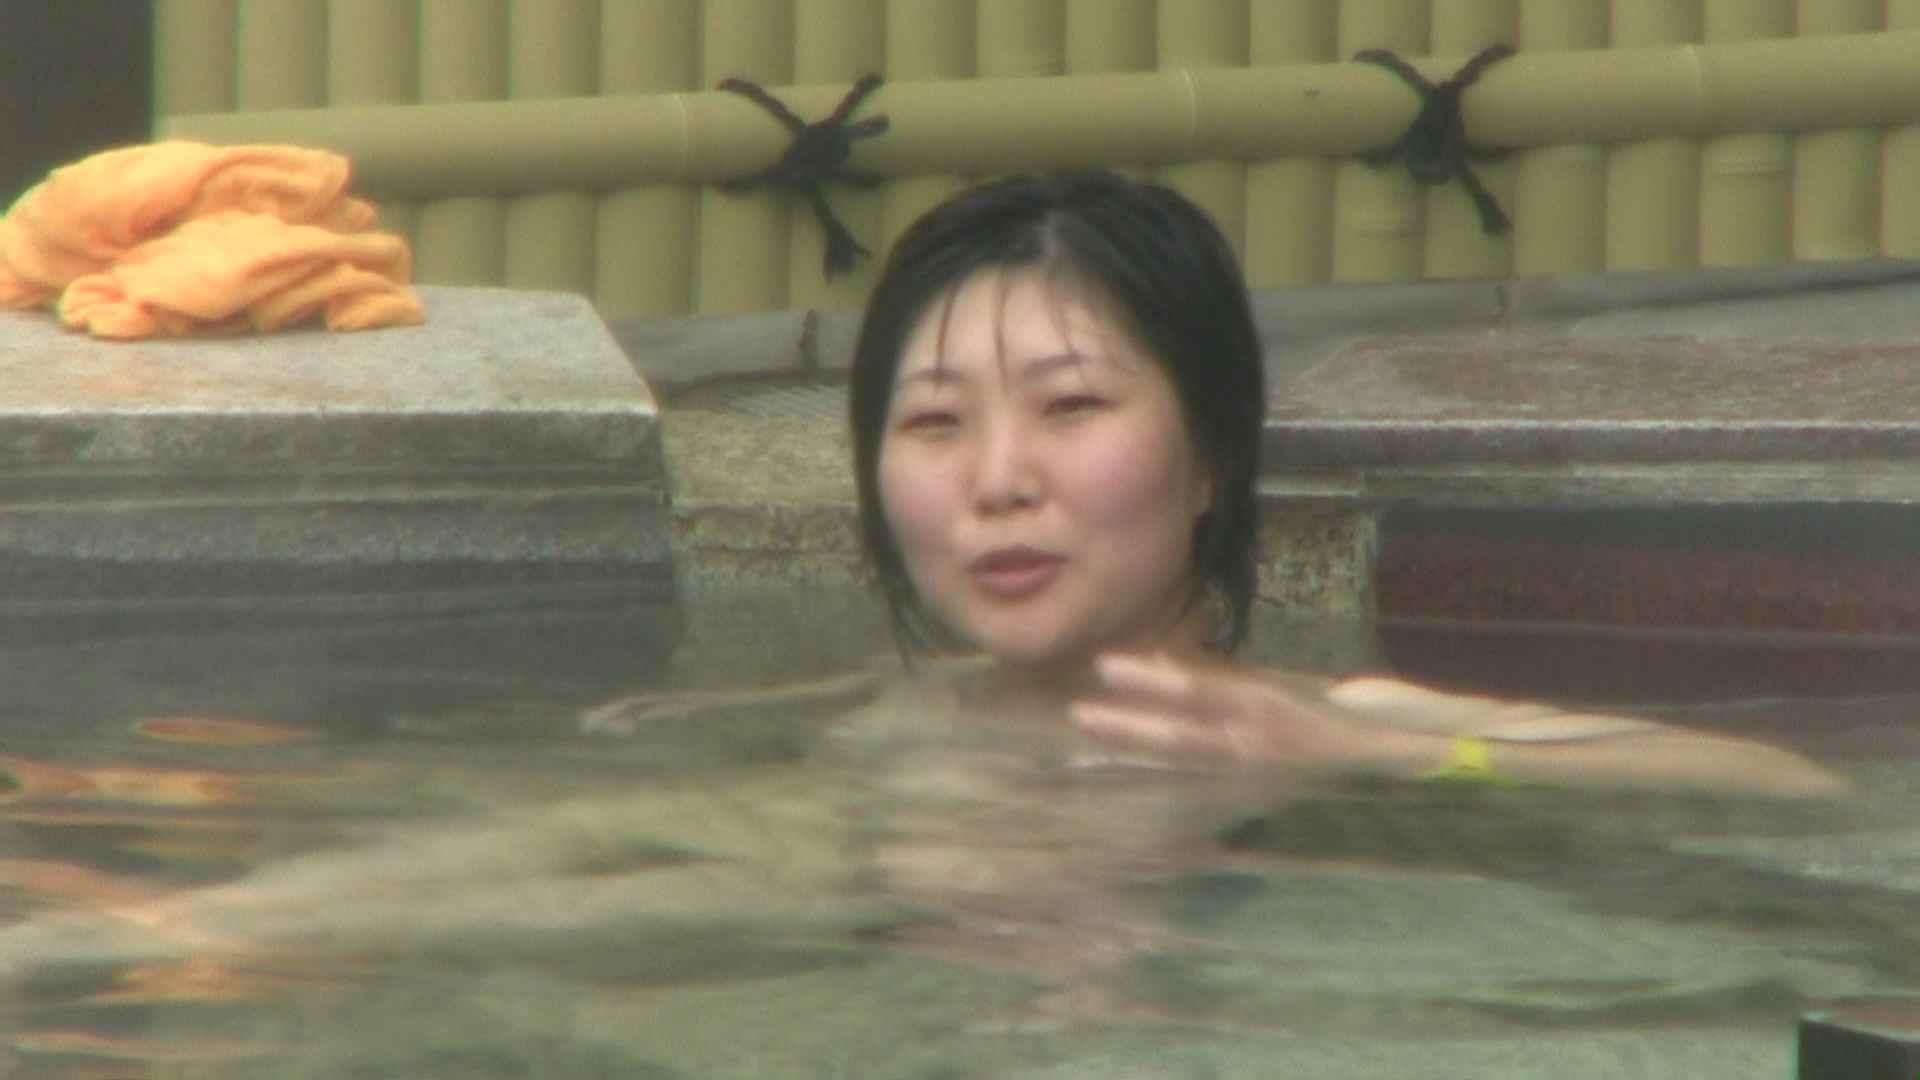 Aquaな露天風呂Vol.75【VIP限定】 盗撮特撮   OLのプライベート  10pic 10